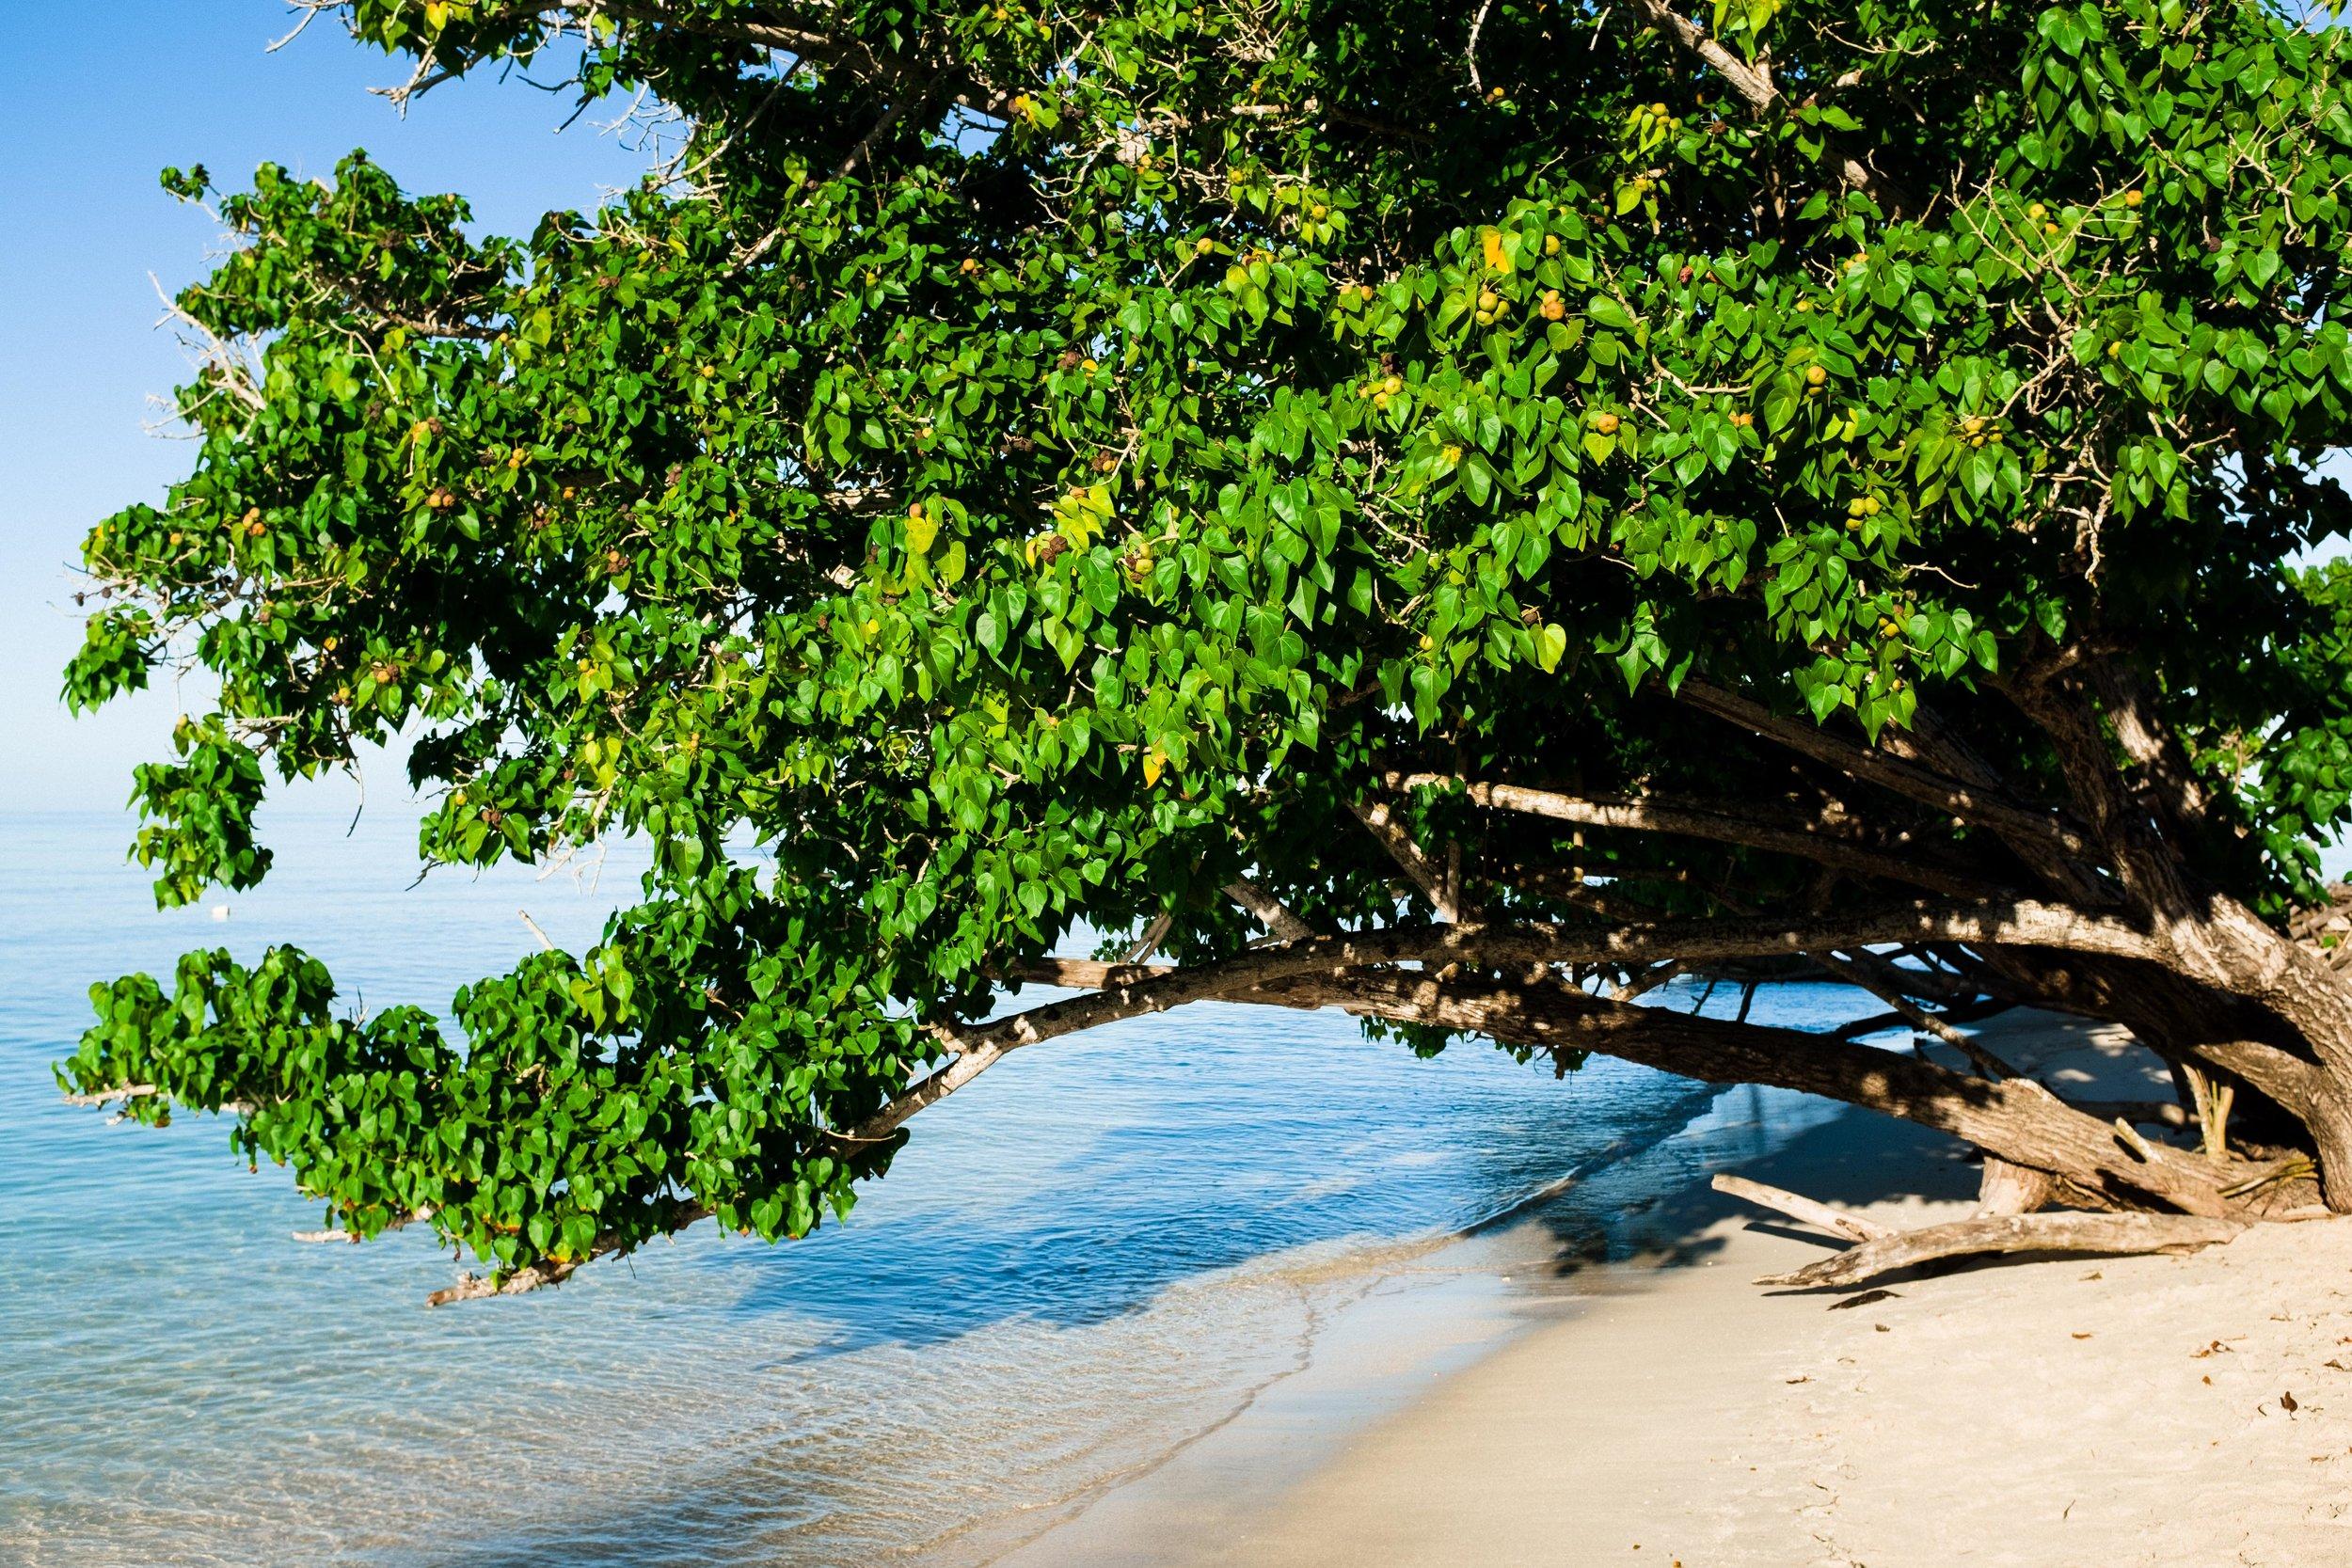 puerto-rico-cabo-rojo-playa-buye-beach-6678.jpg